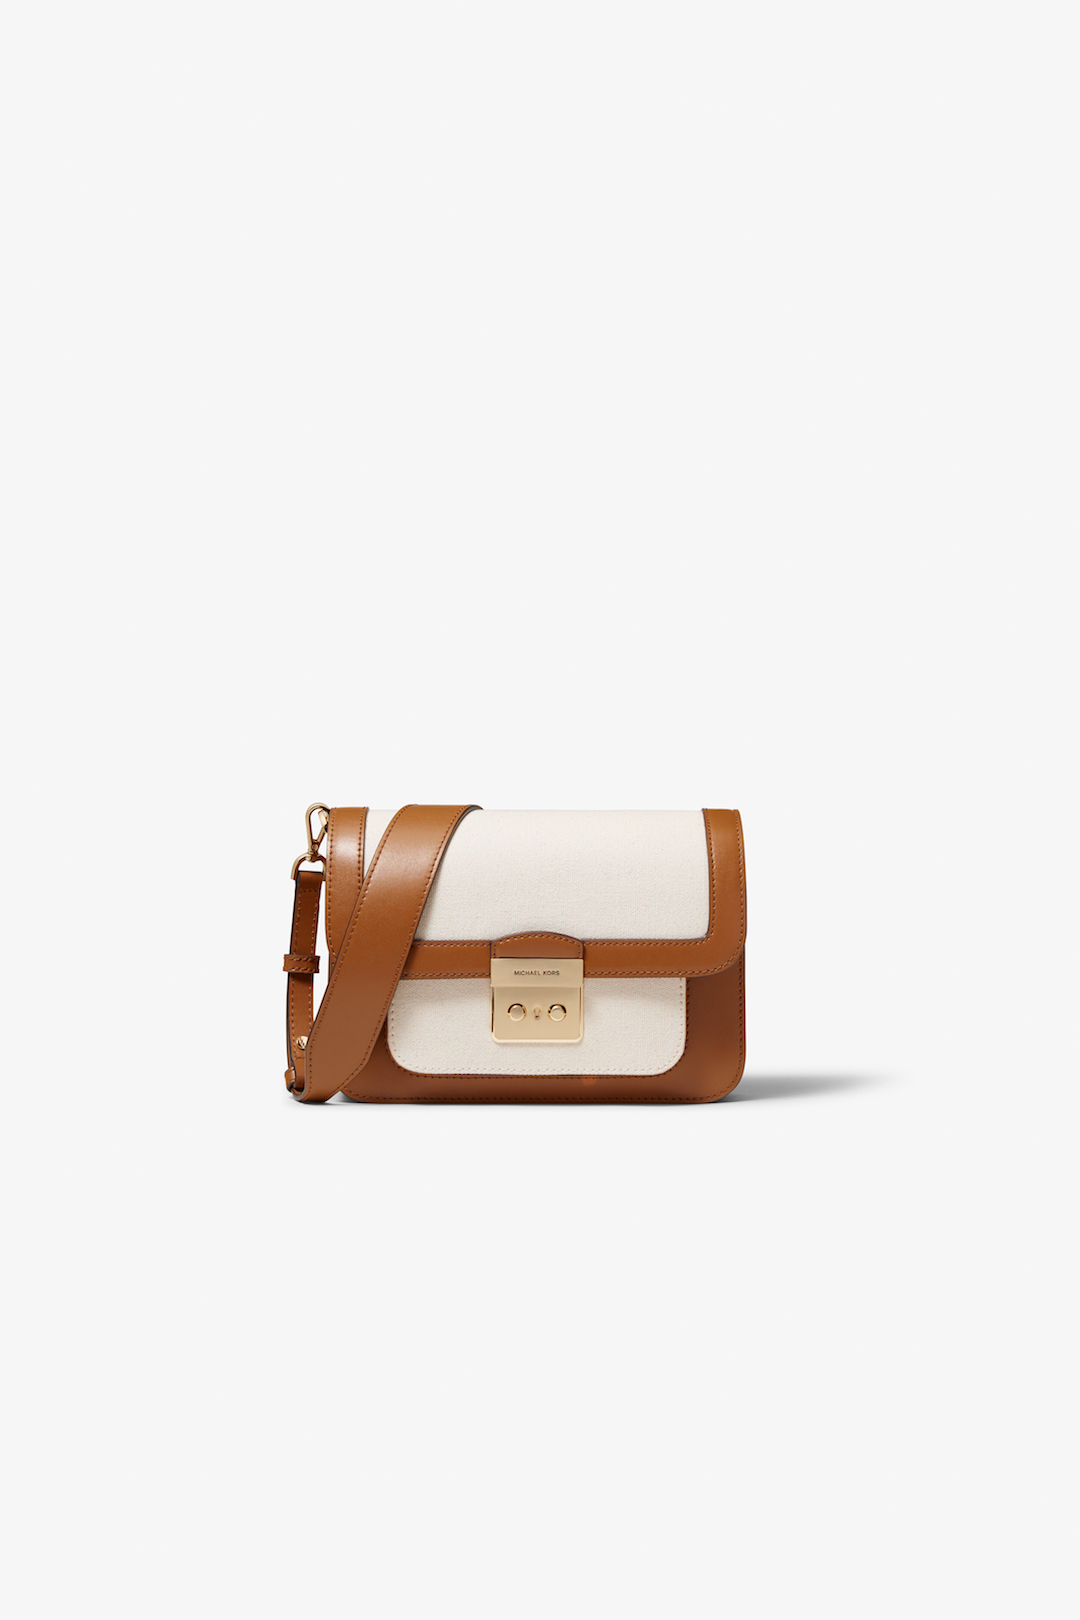 MICHAEL Michael Kors Canvas Leather Sloan Editor Shoulder Bag.jpg